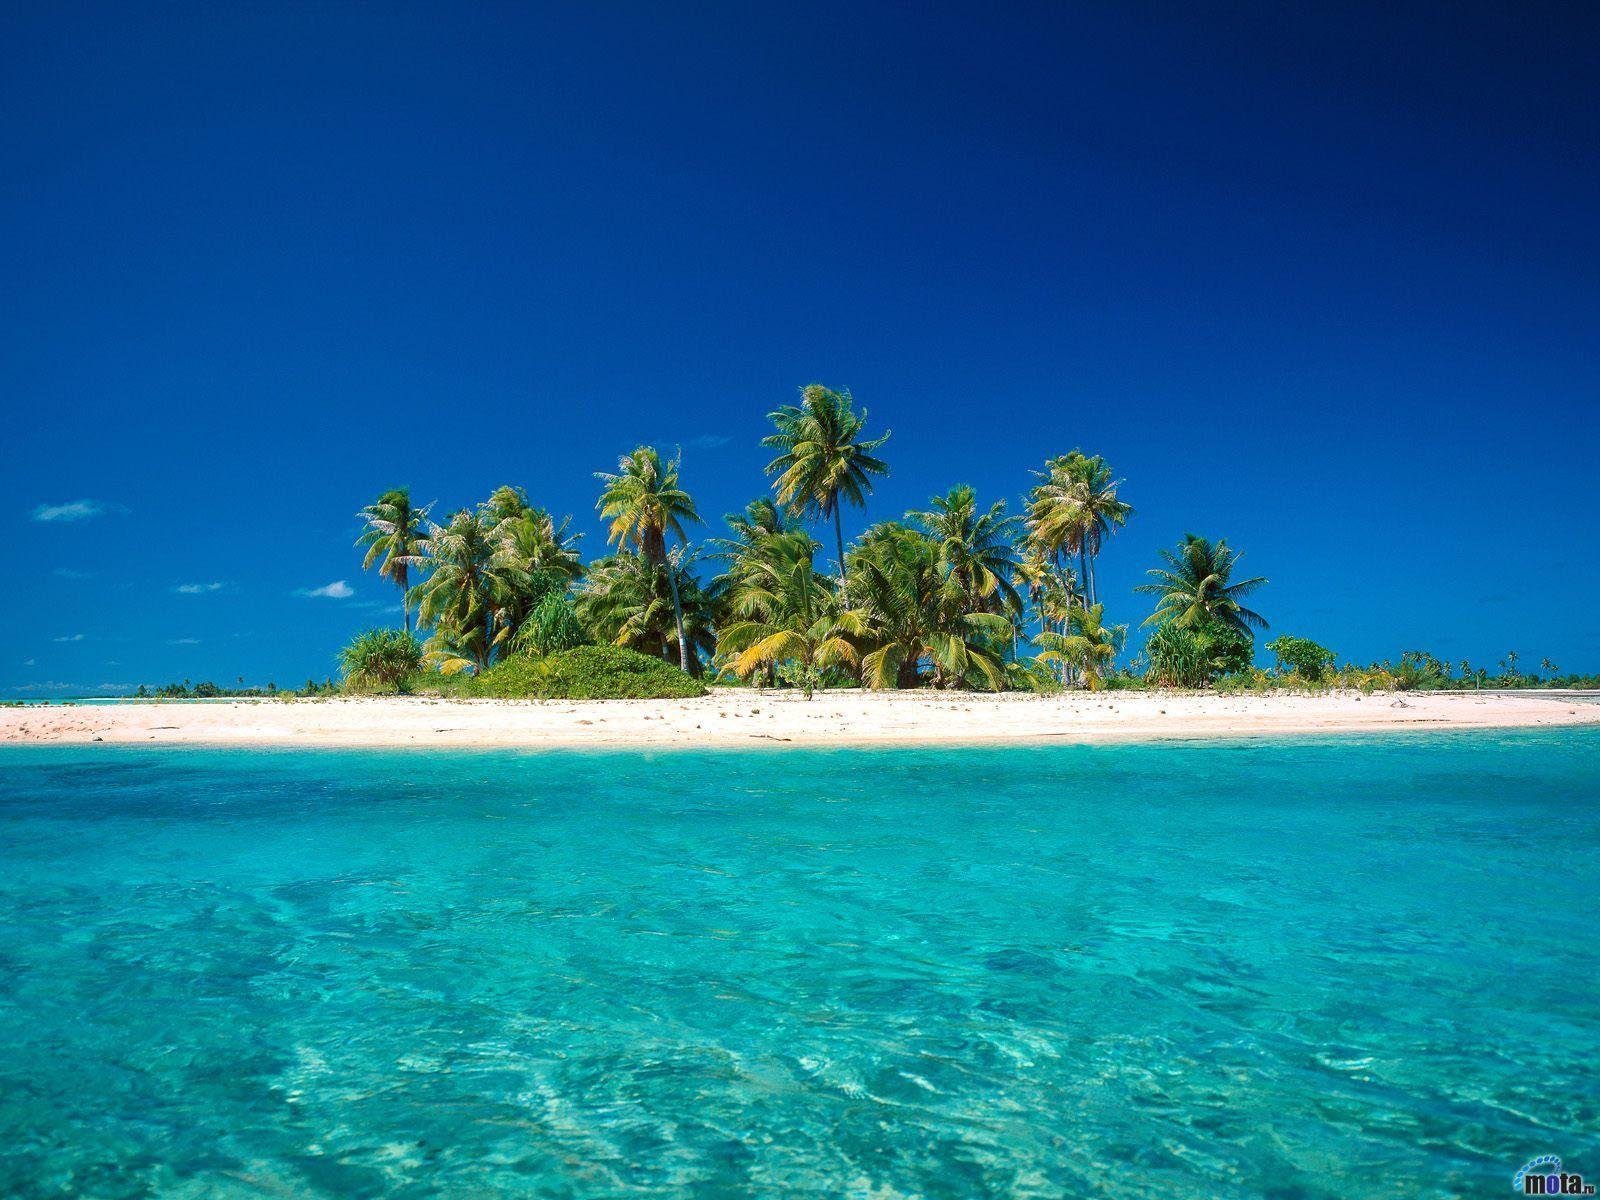 Tropical Island Desktop Wallpapers 1600x1200